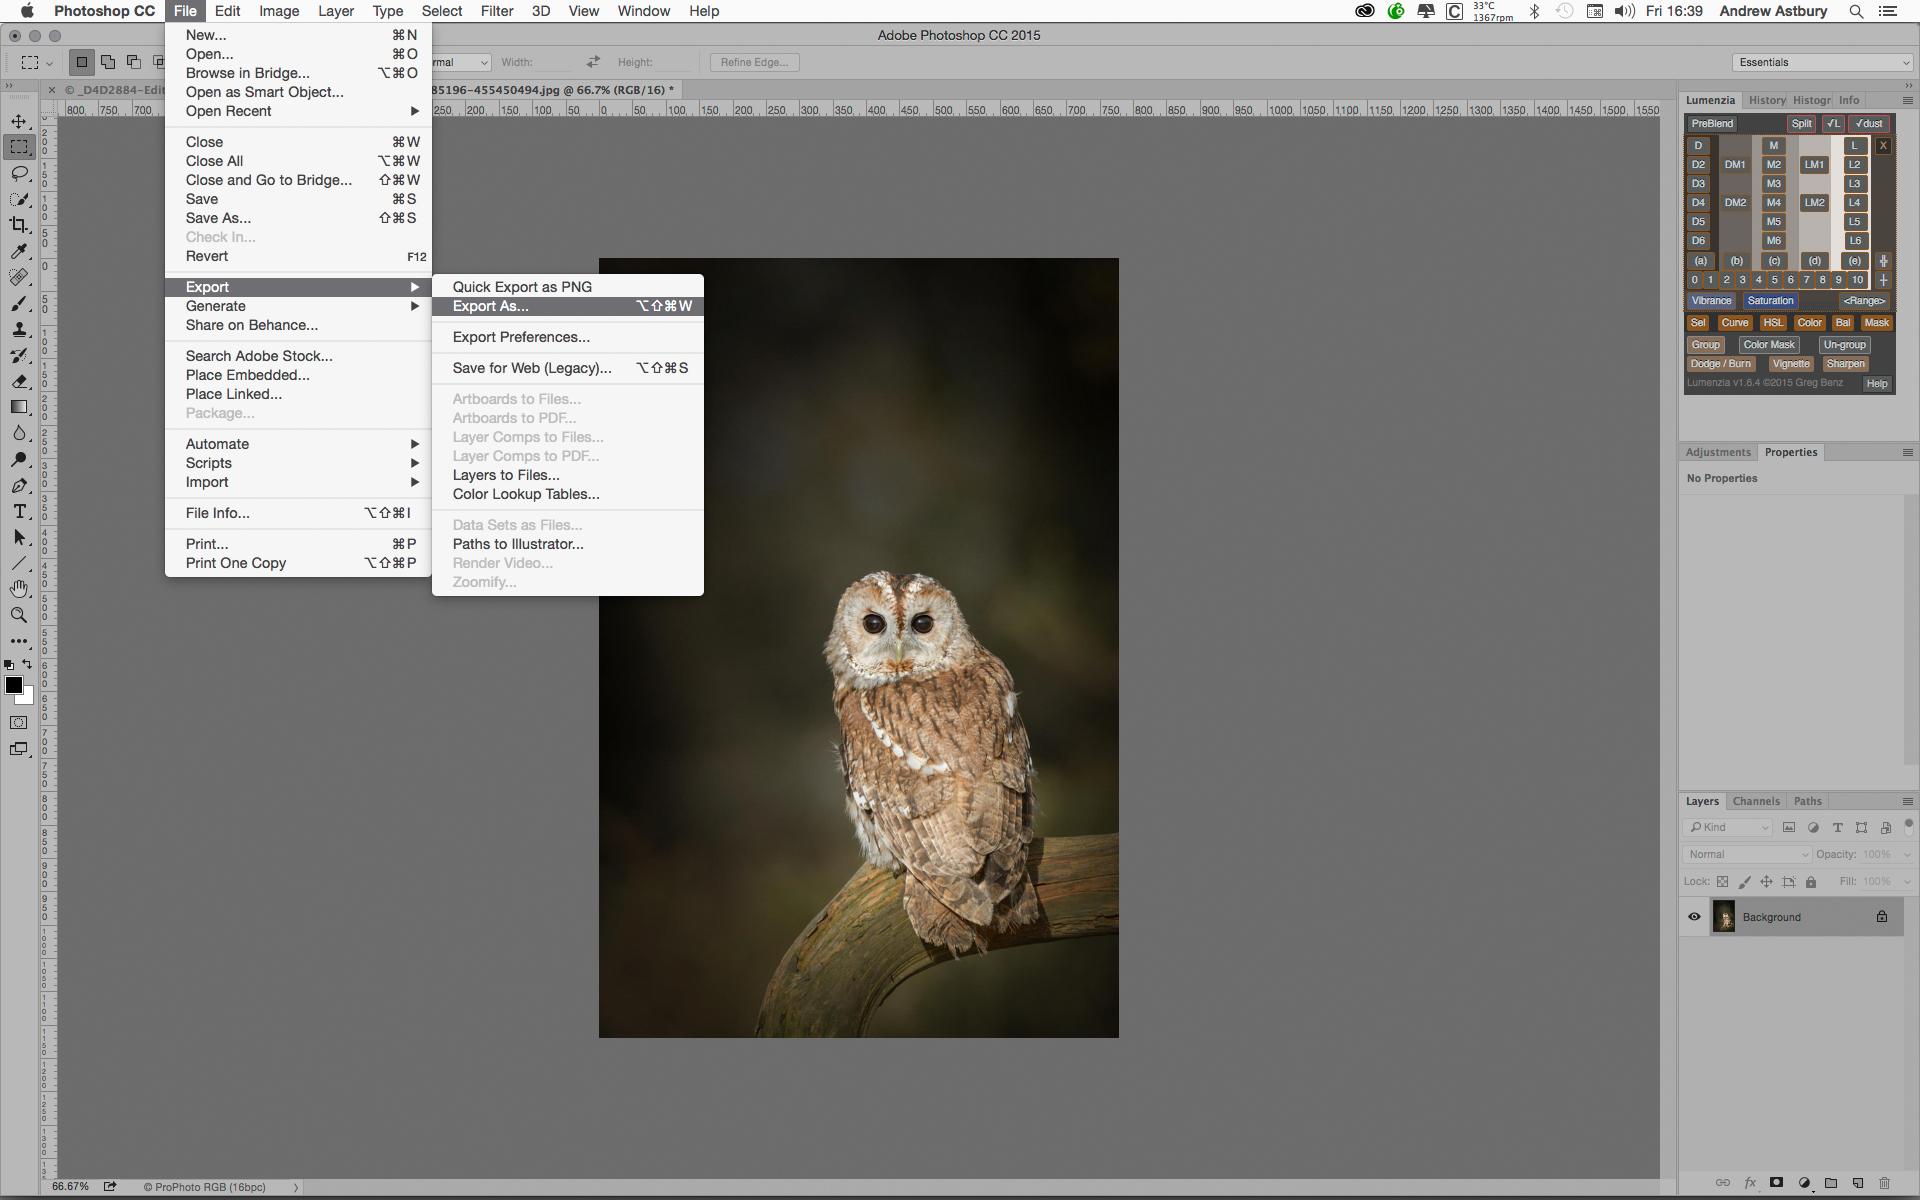 Photoshop metadata and notes - Adobe